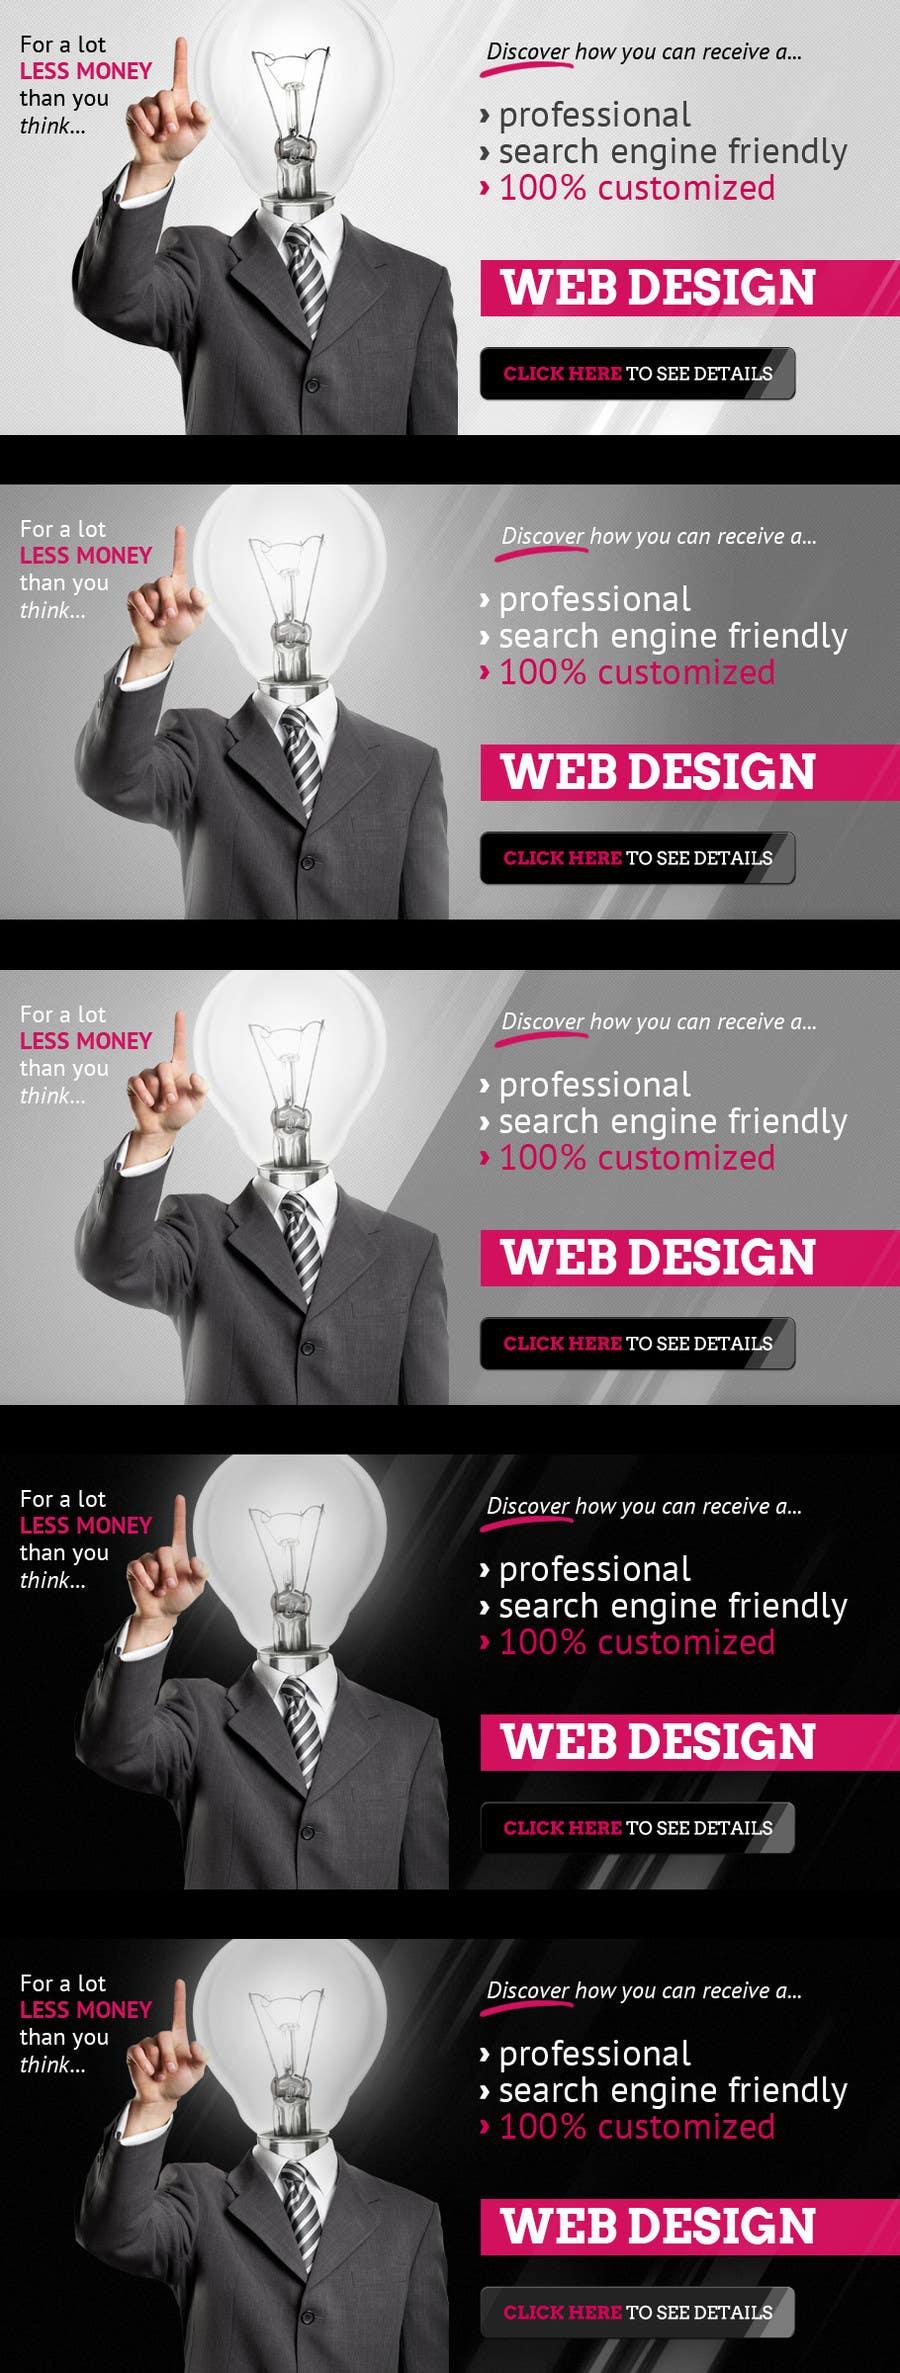 Kilpailutyö #73 kilpailussa Banner Ad Design for www.MarketHouse.us